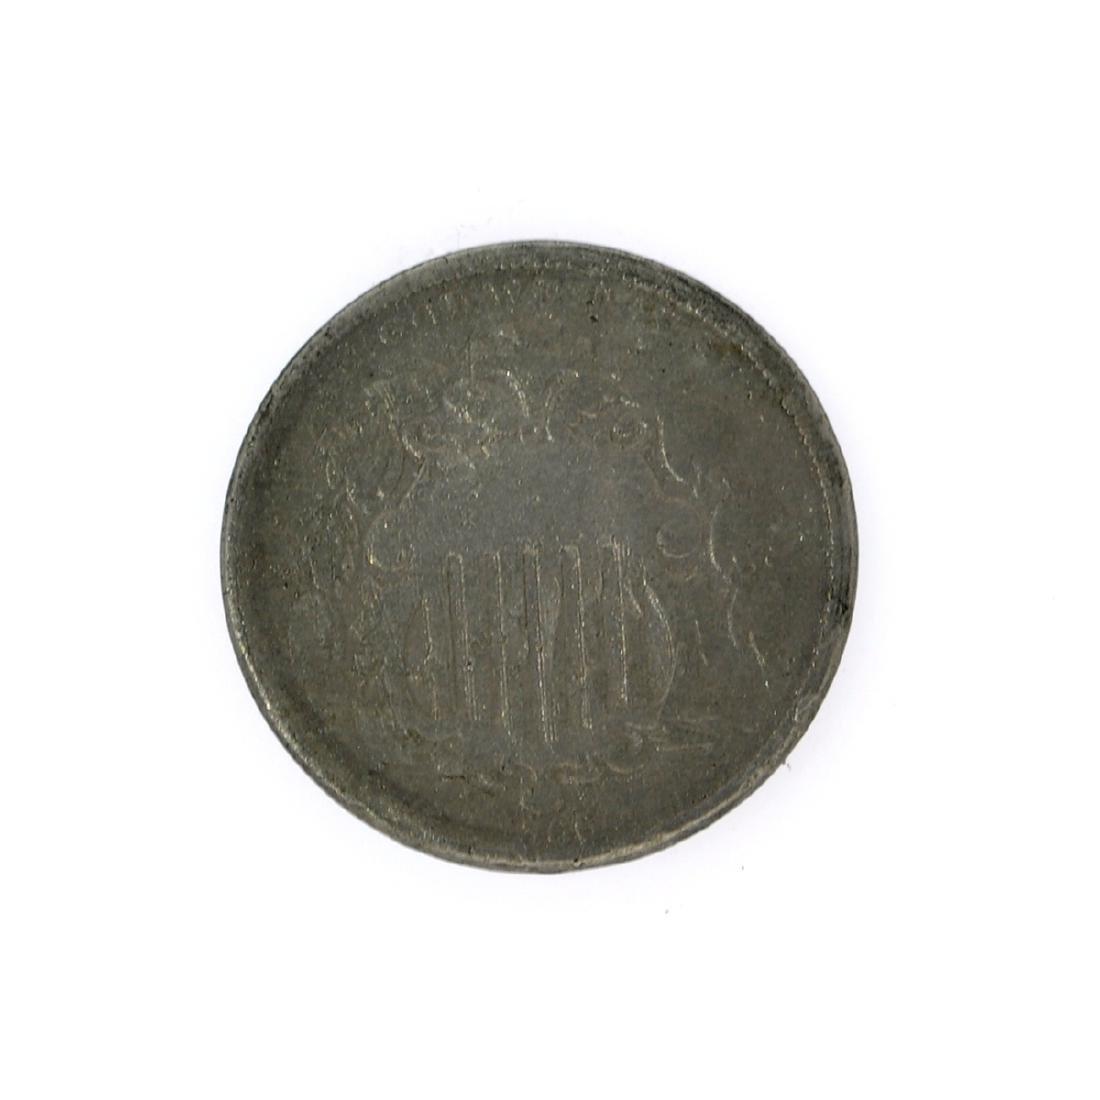 1866 Rays Shield Nickel Coin